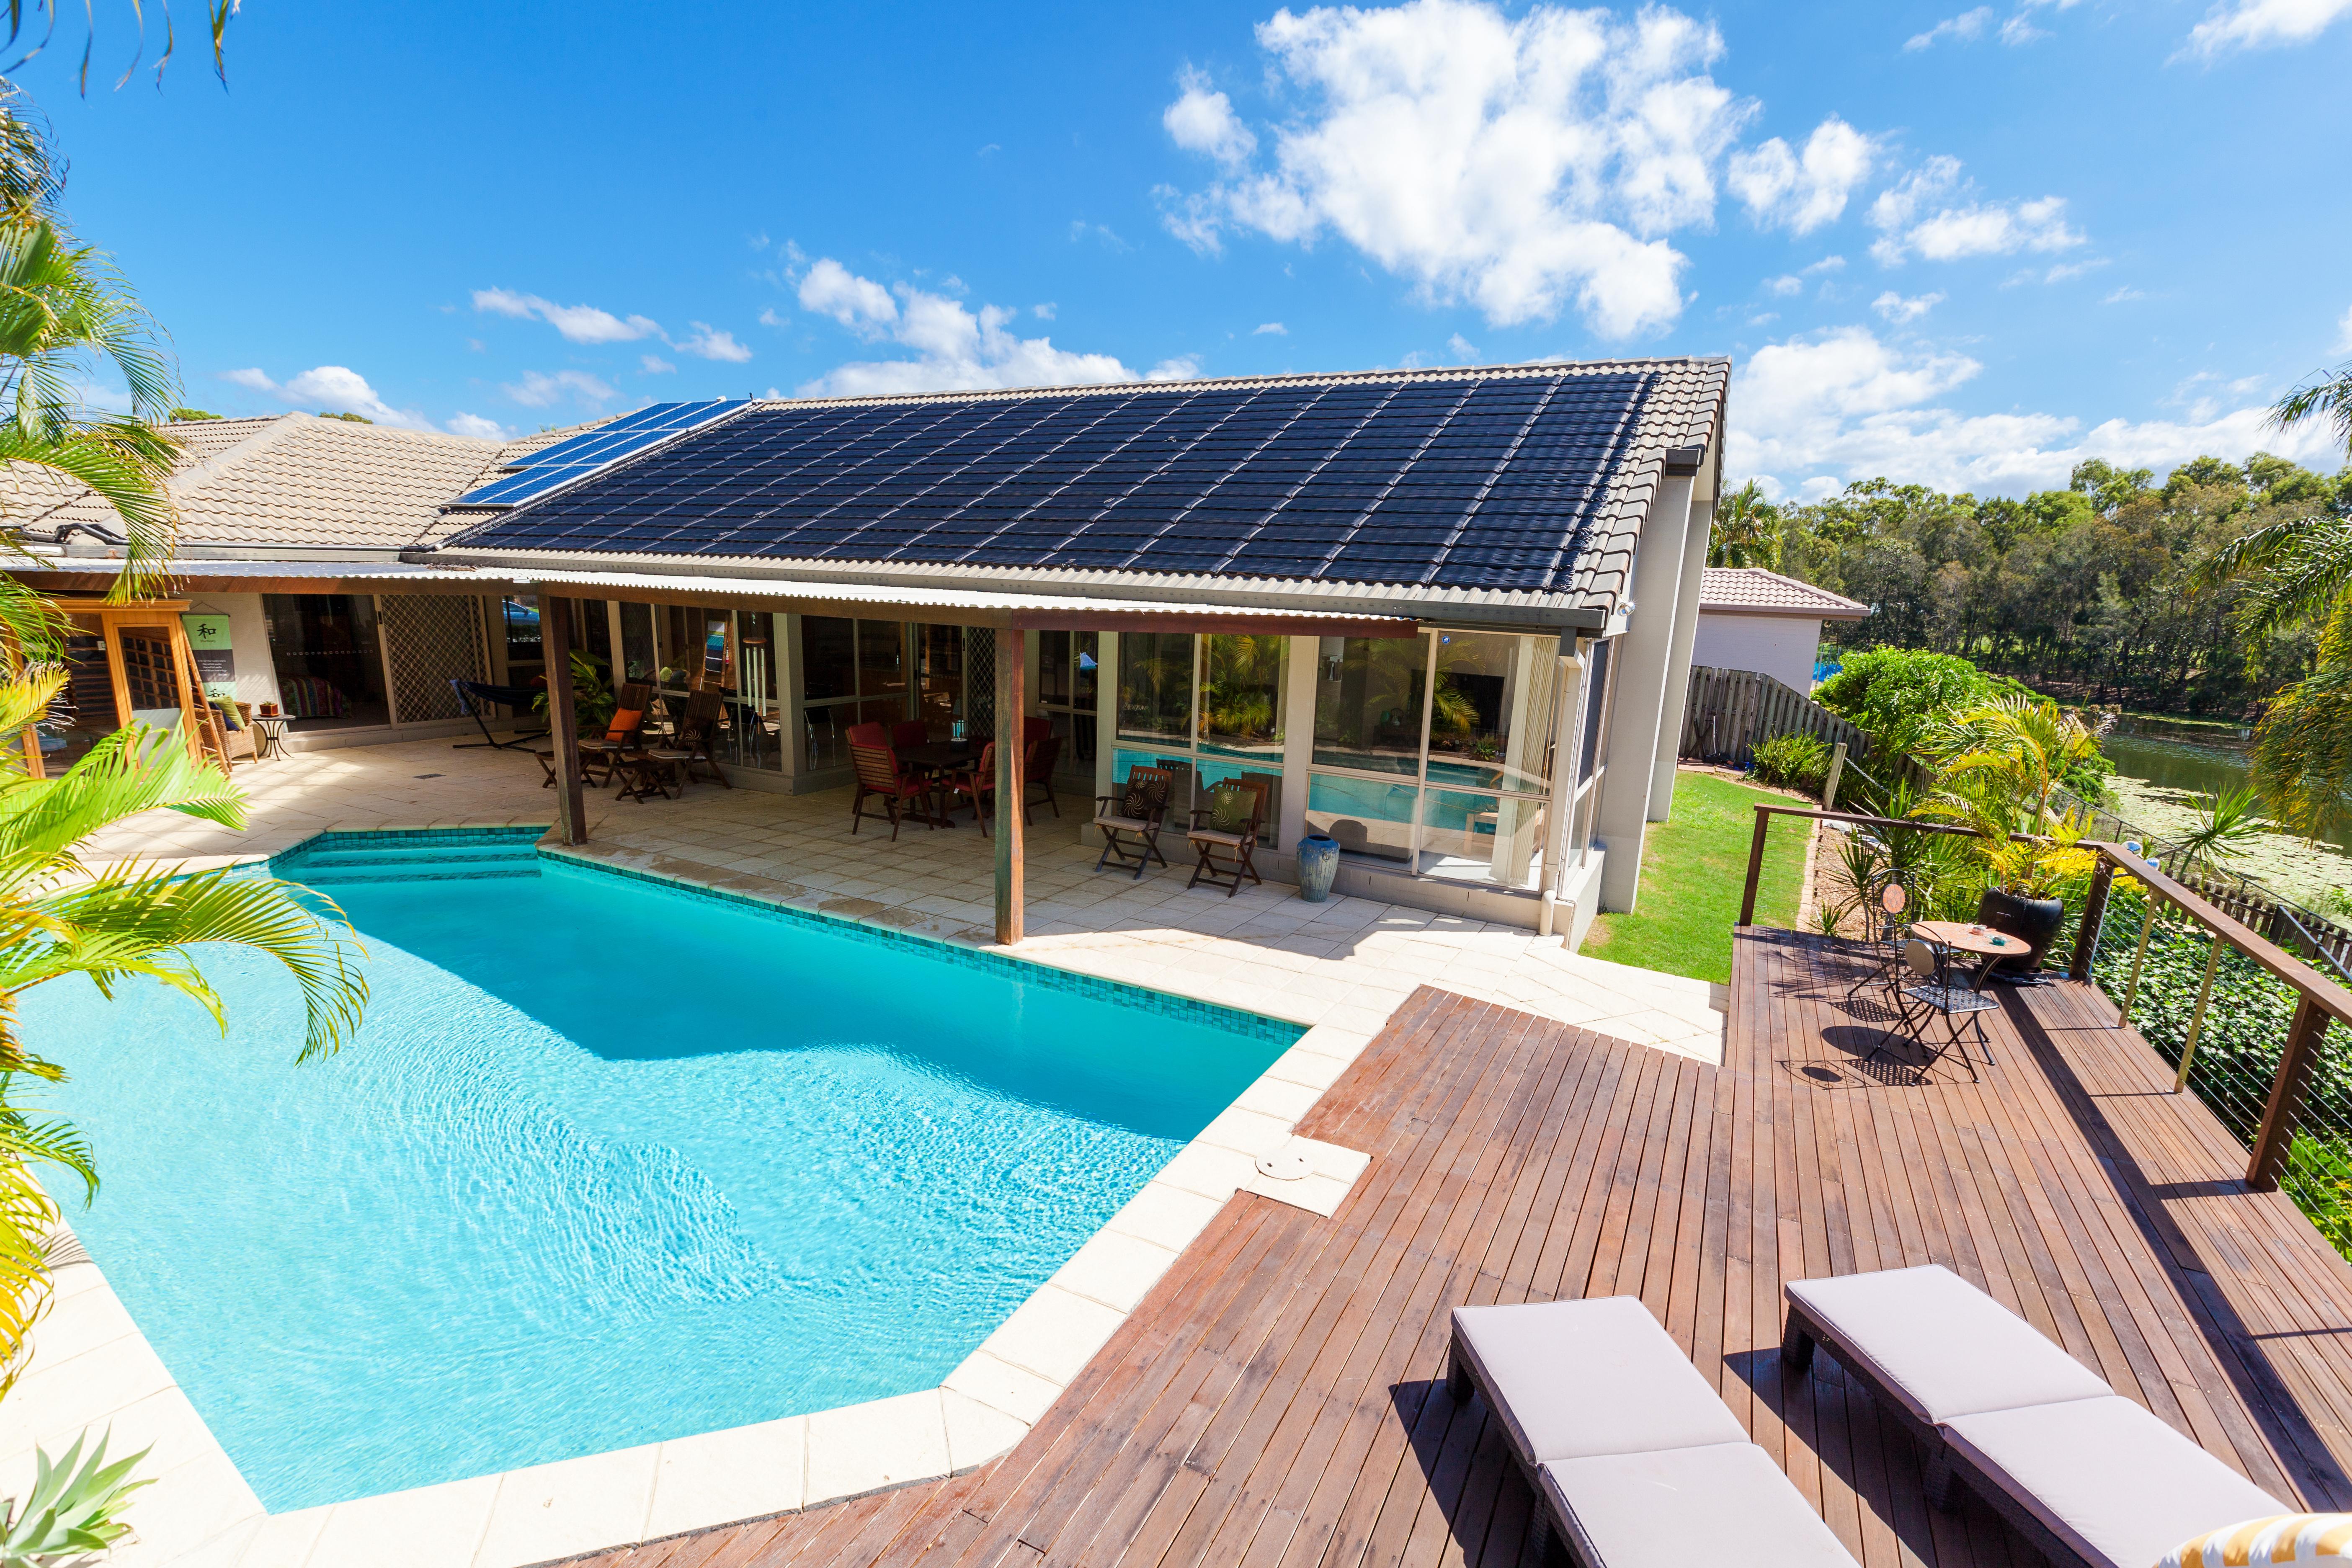 Backyard with swimming pool in stylish h